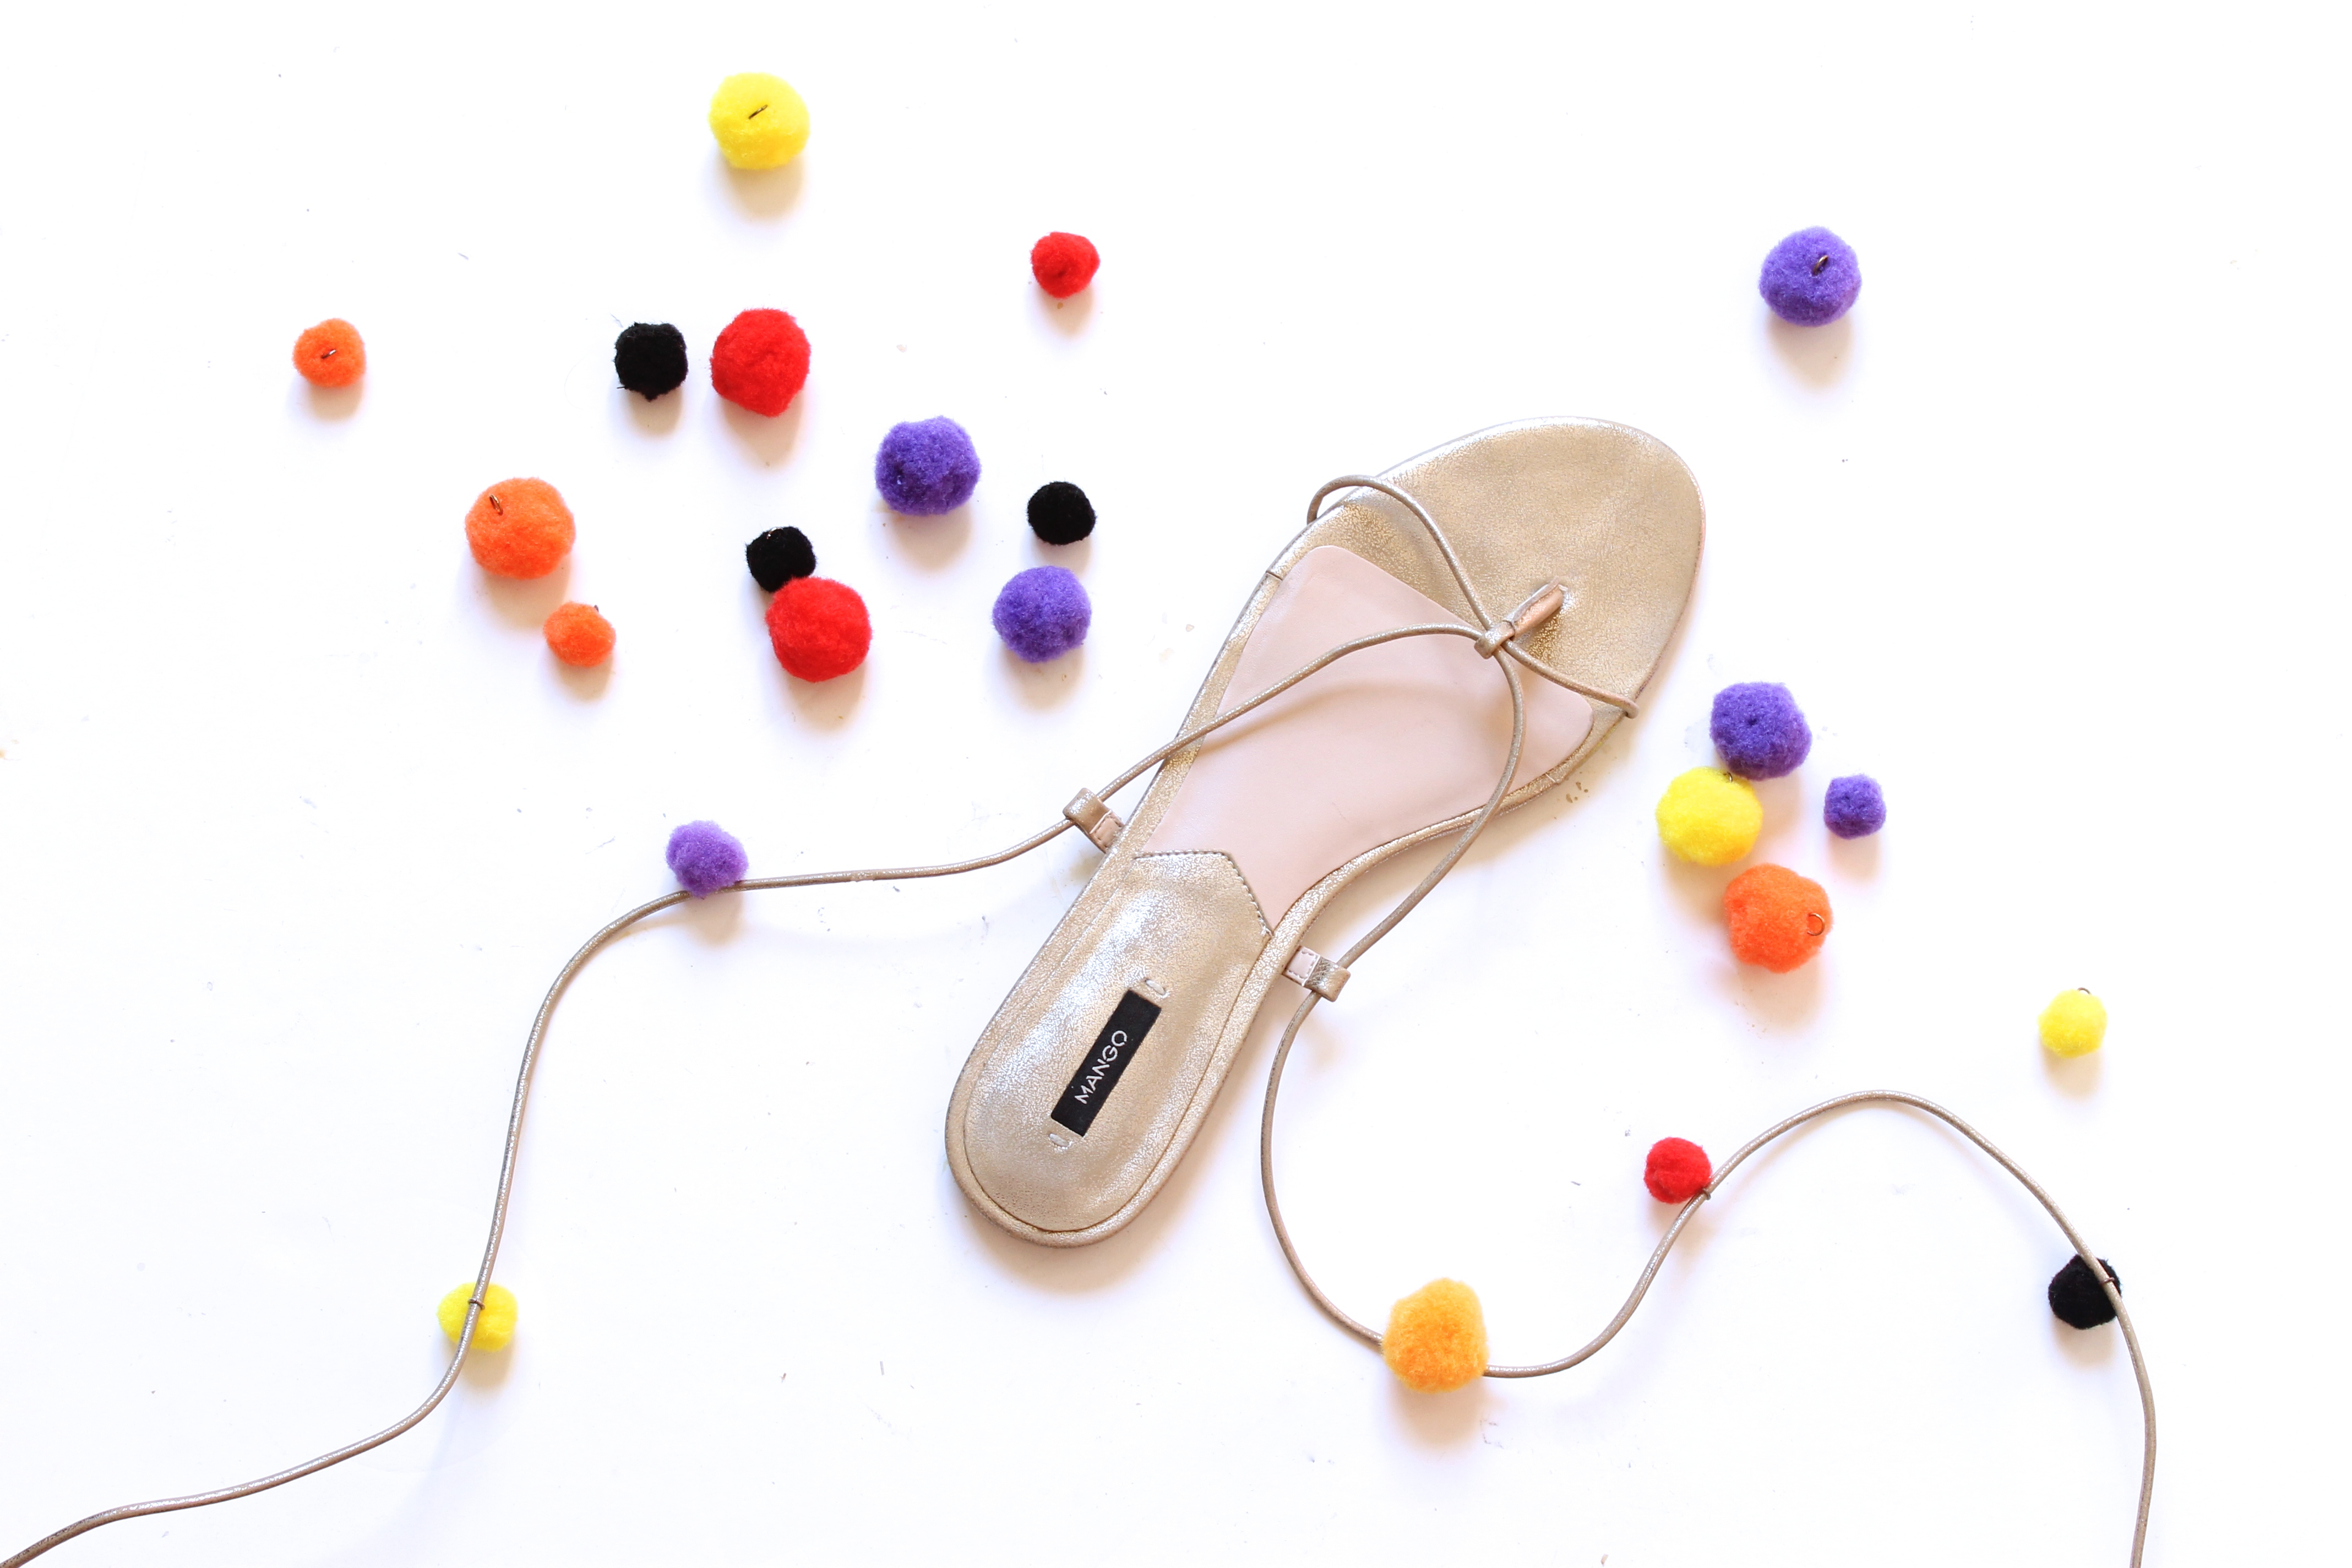 enfiler-pompons-sur-brides-sandales-2